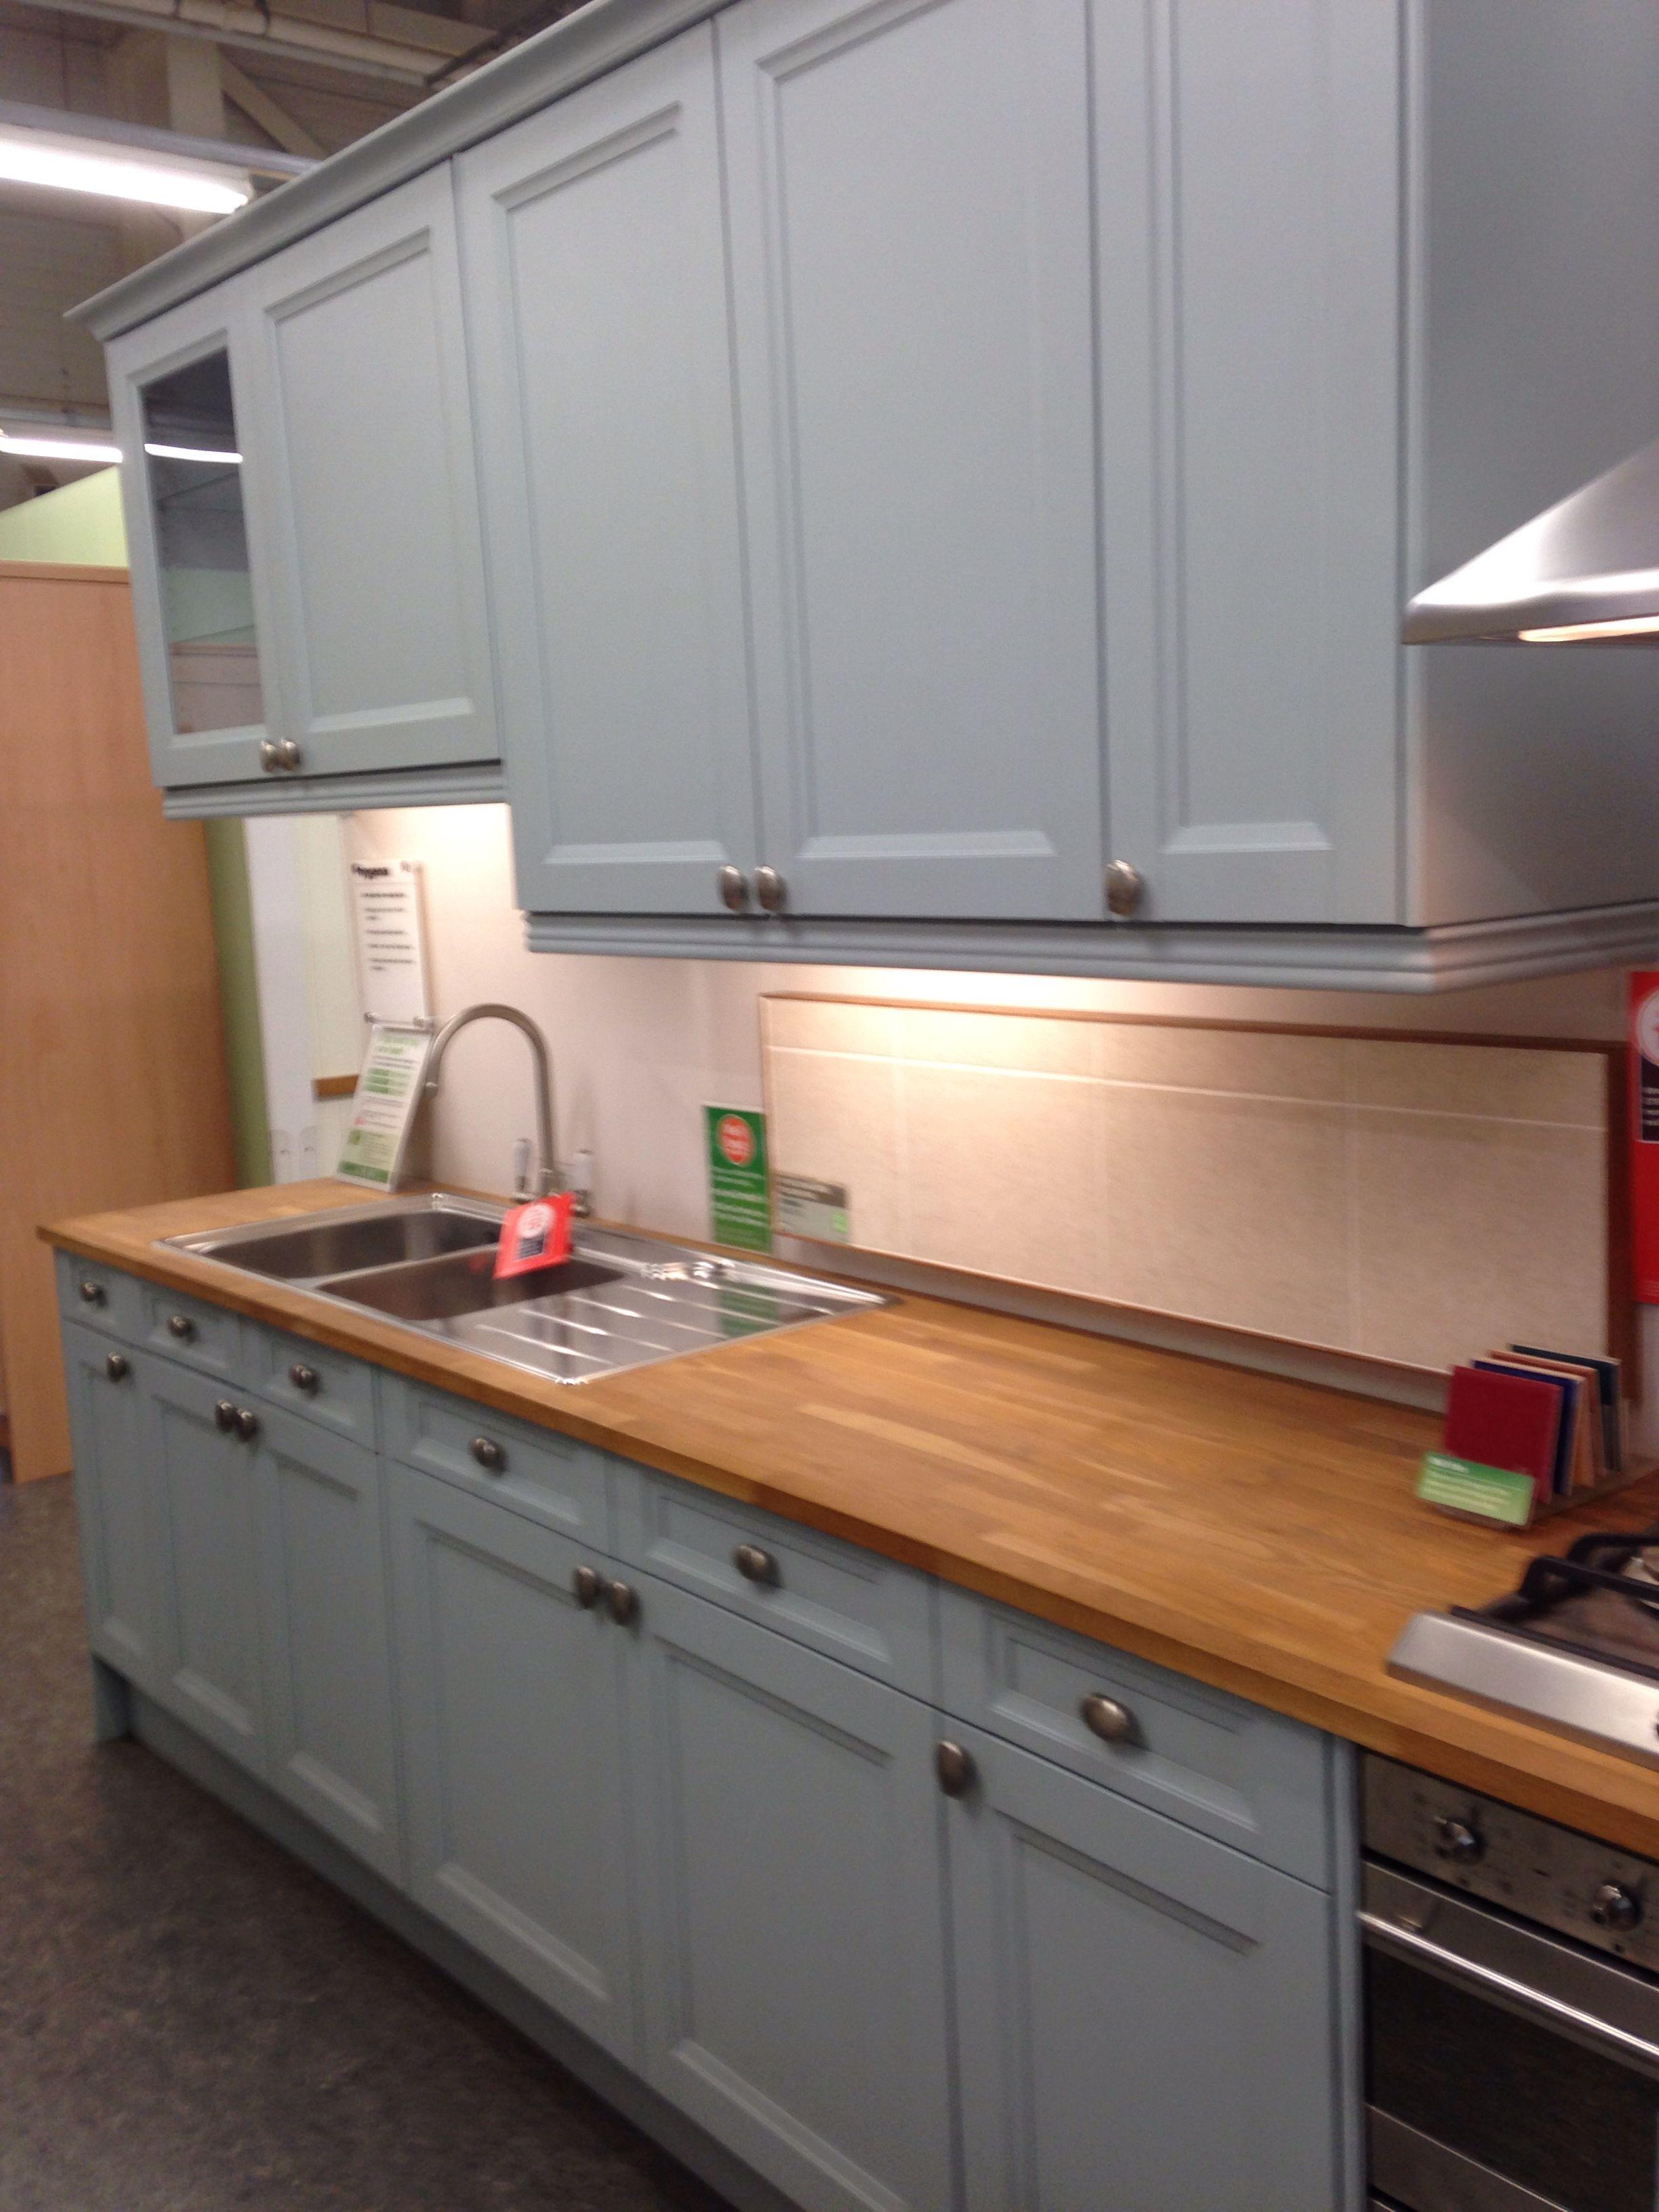 Hygena Kitchen From Homebase Kitchen Accessories Decor White Kitchen Island Kitchen